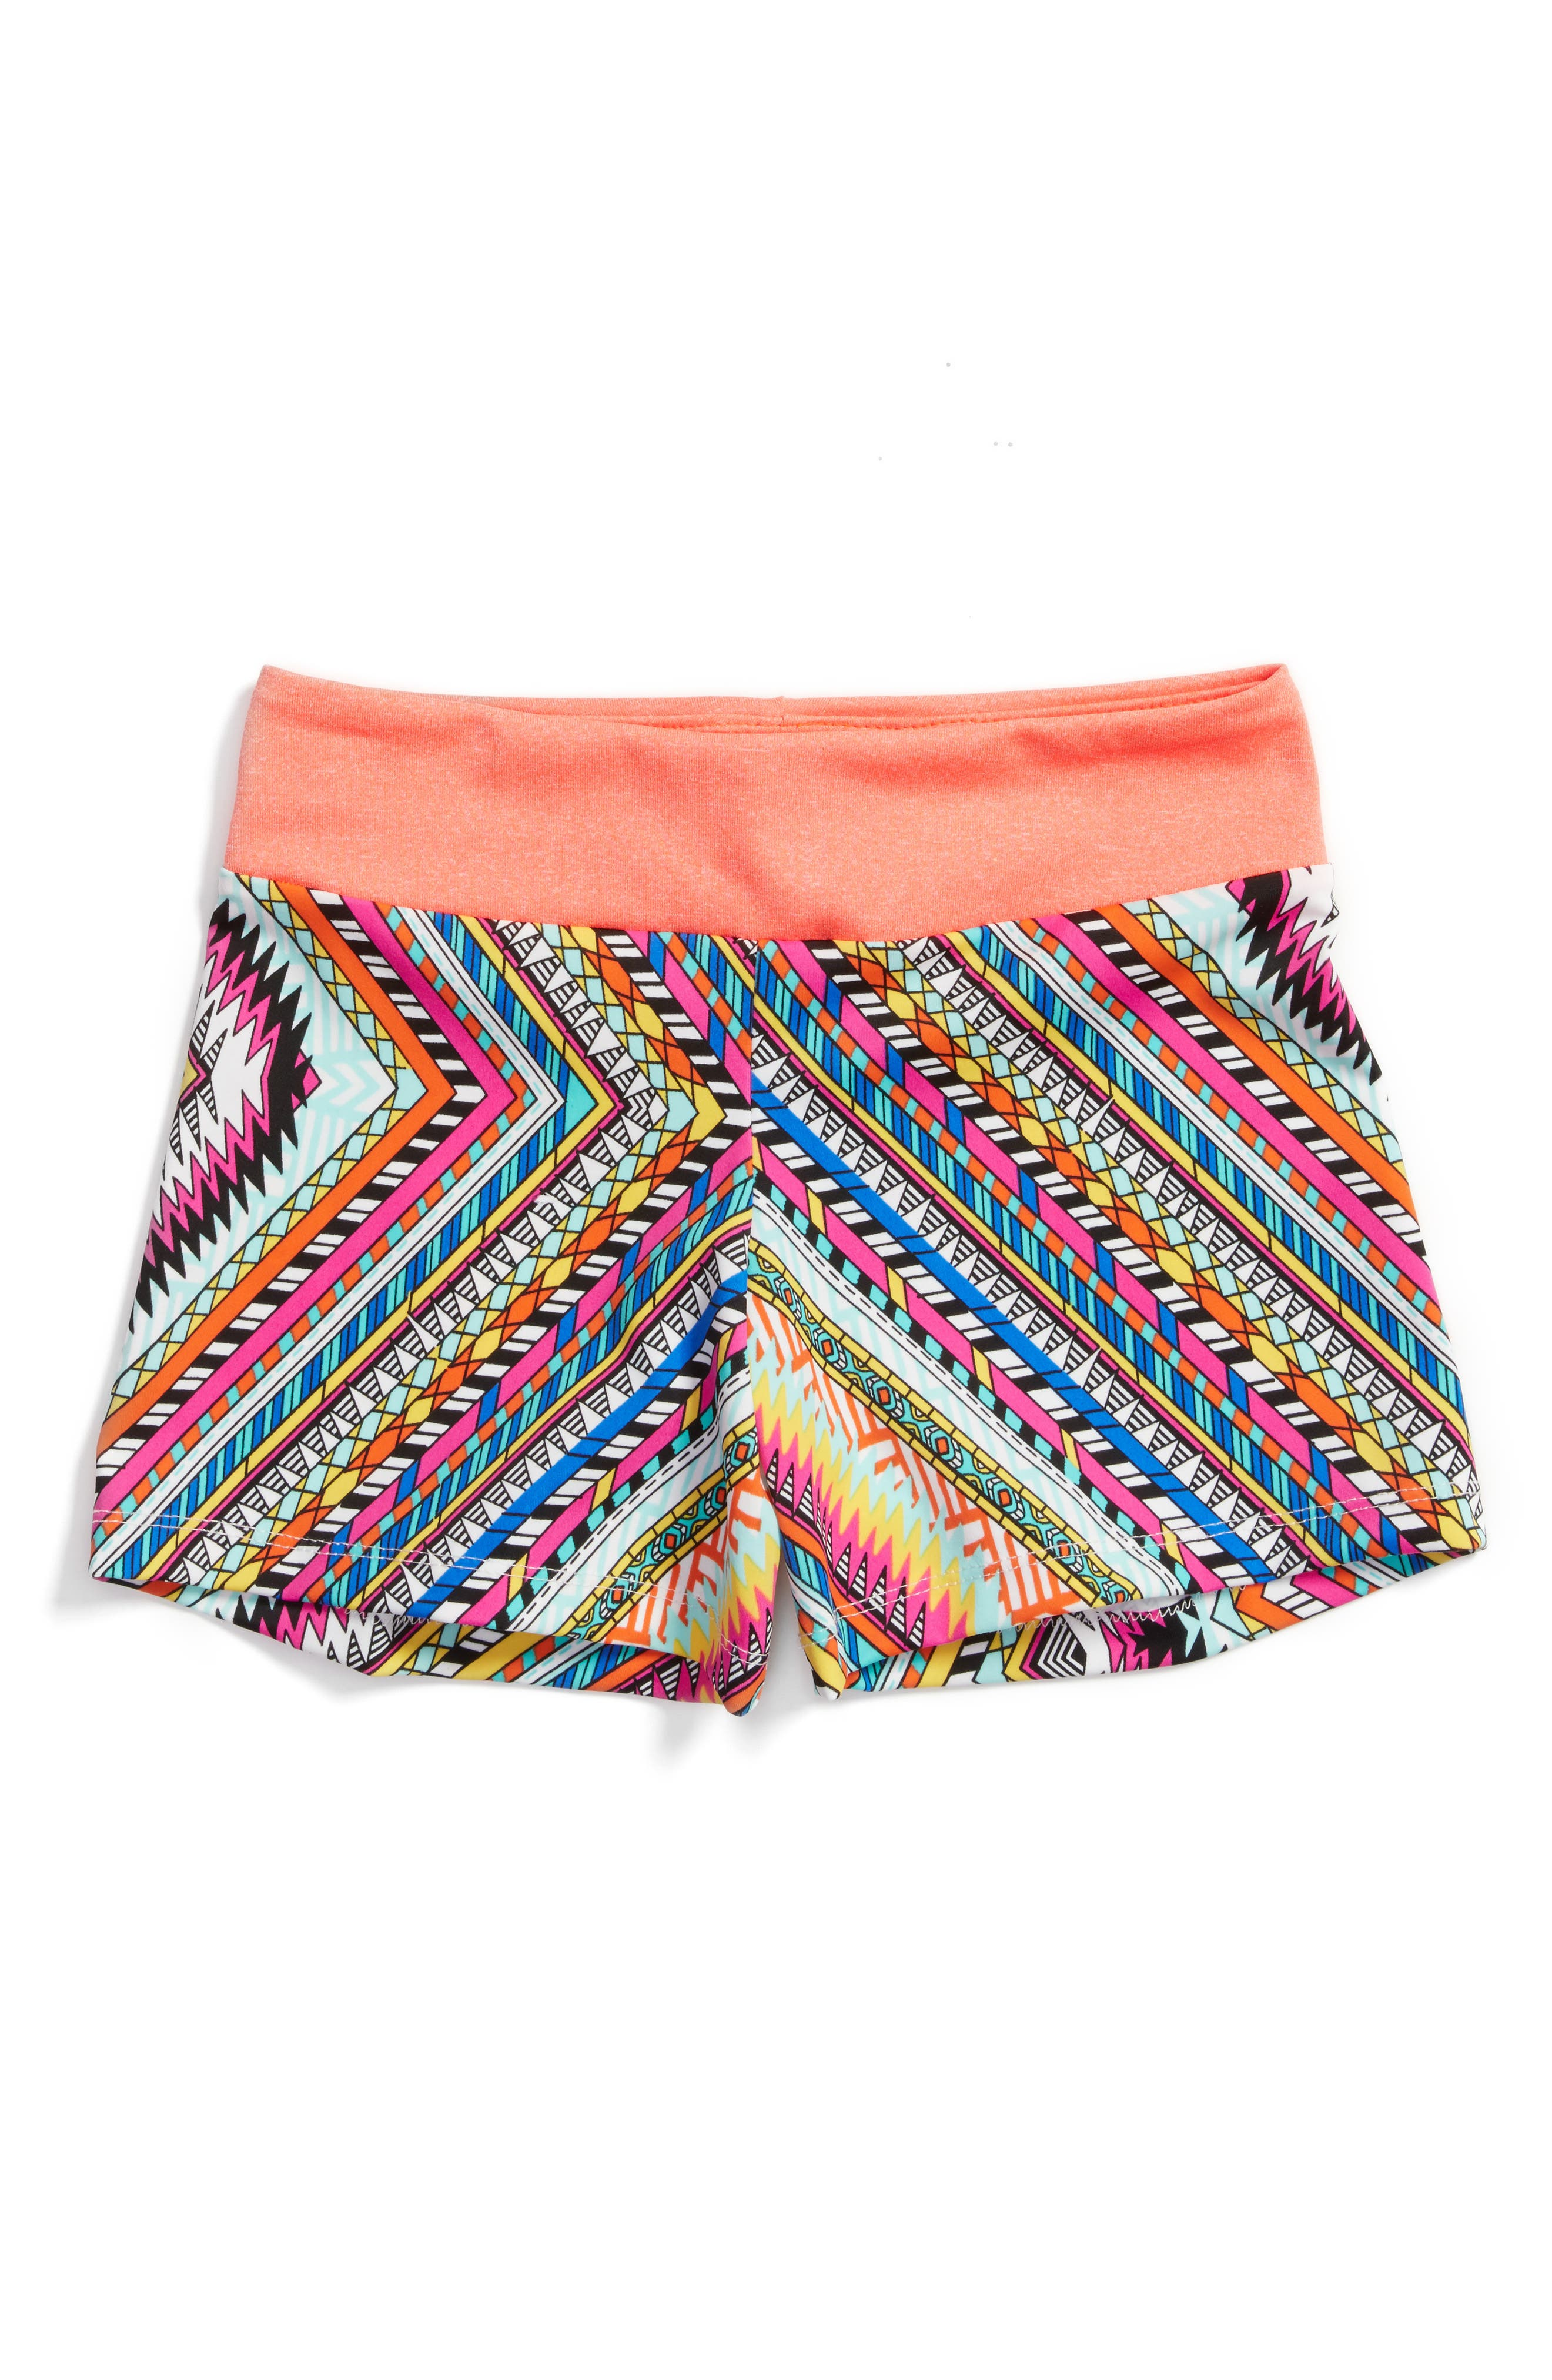 Zigzag Stretch Shorts,                             Main thumbnail 1, color,                             950